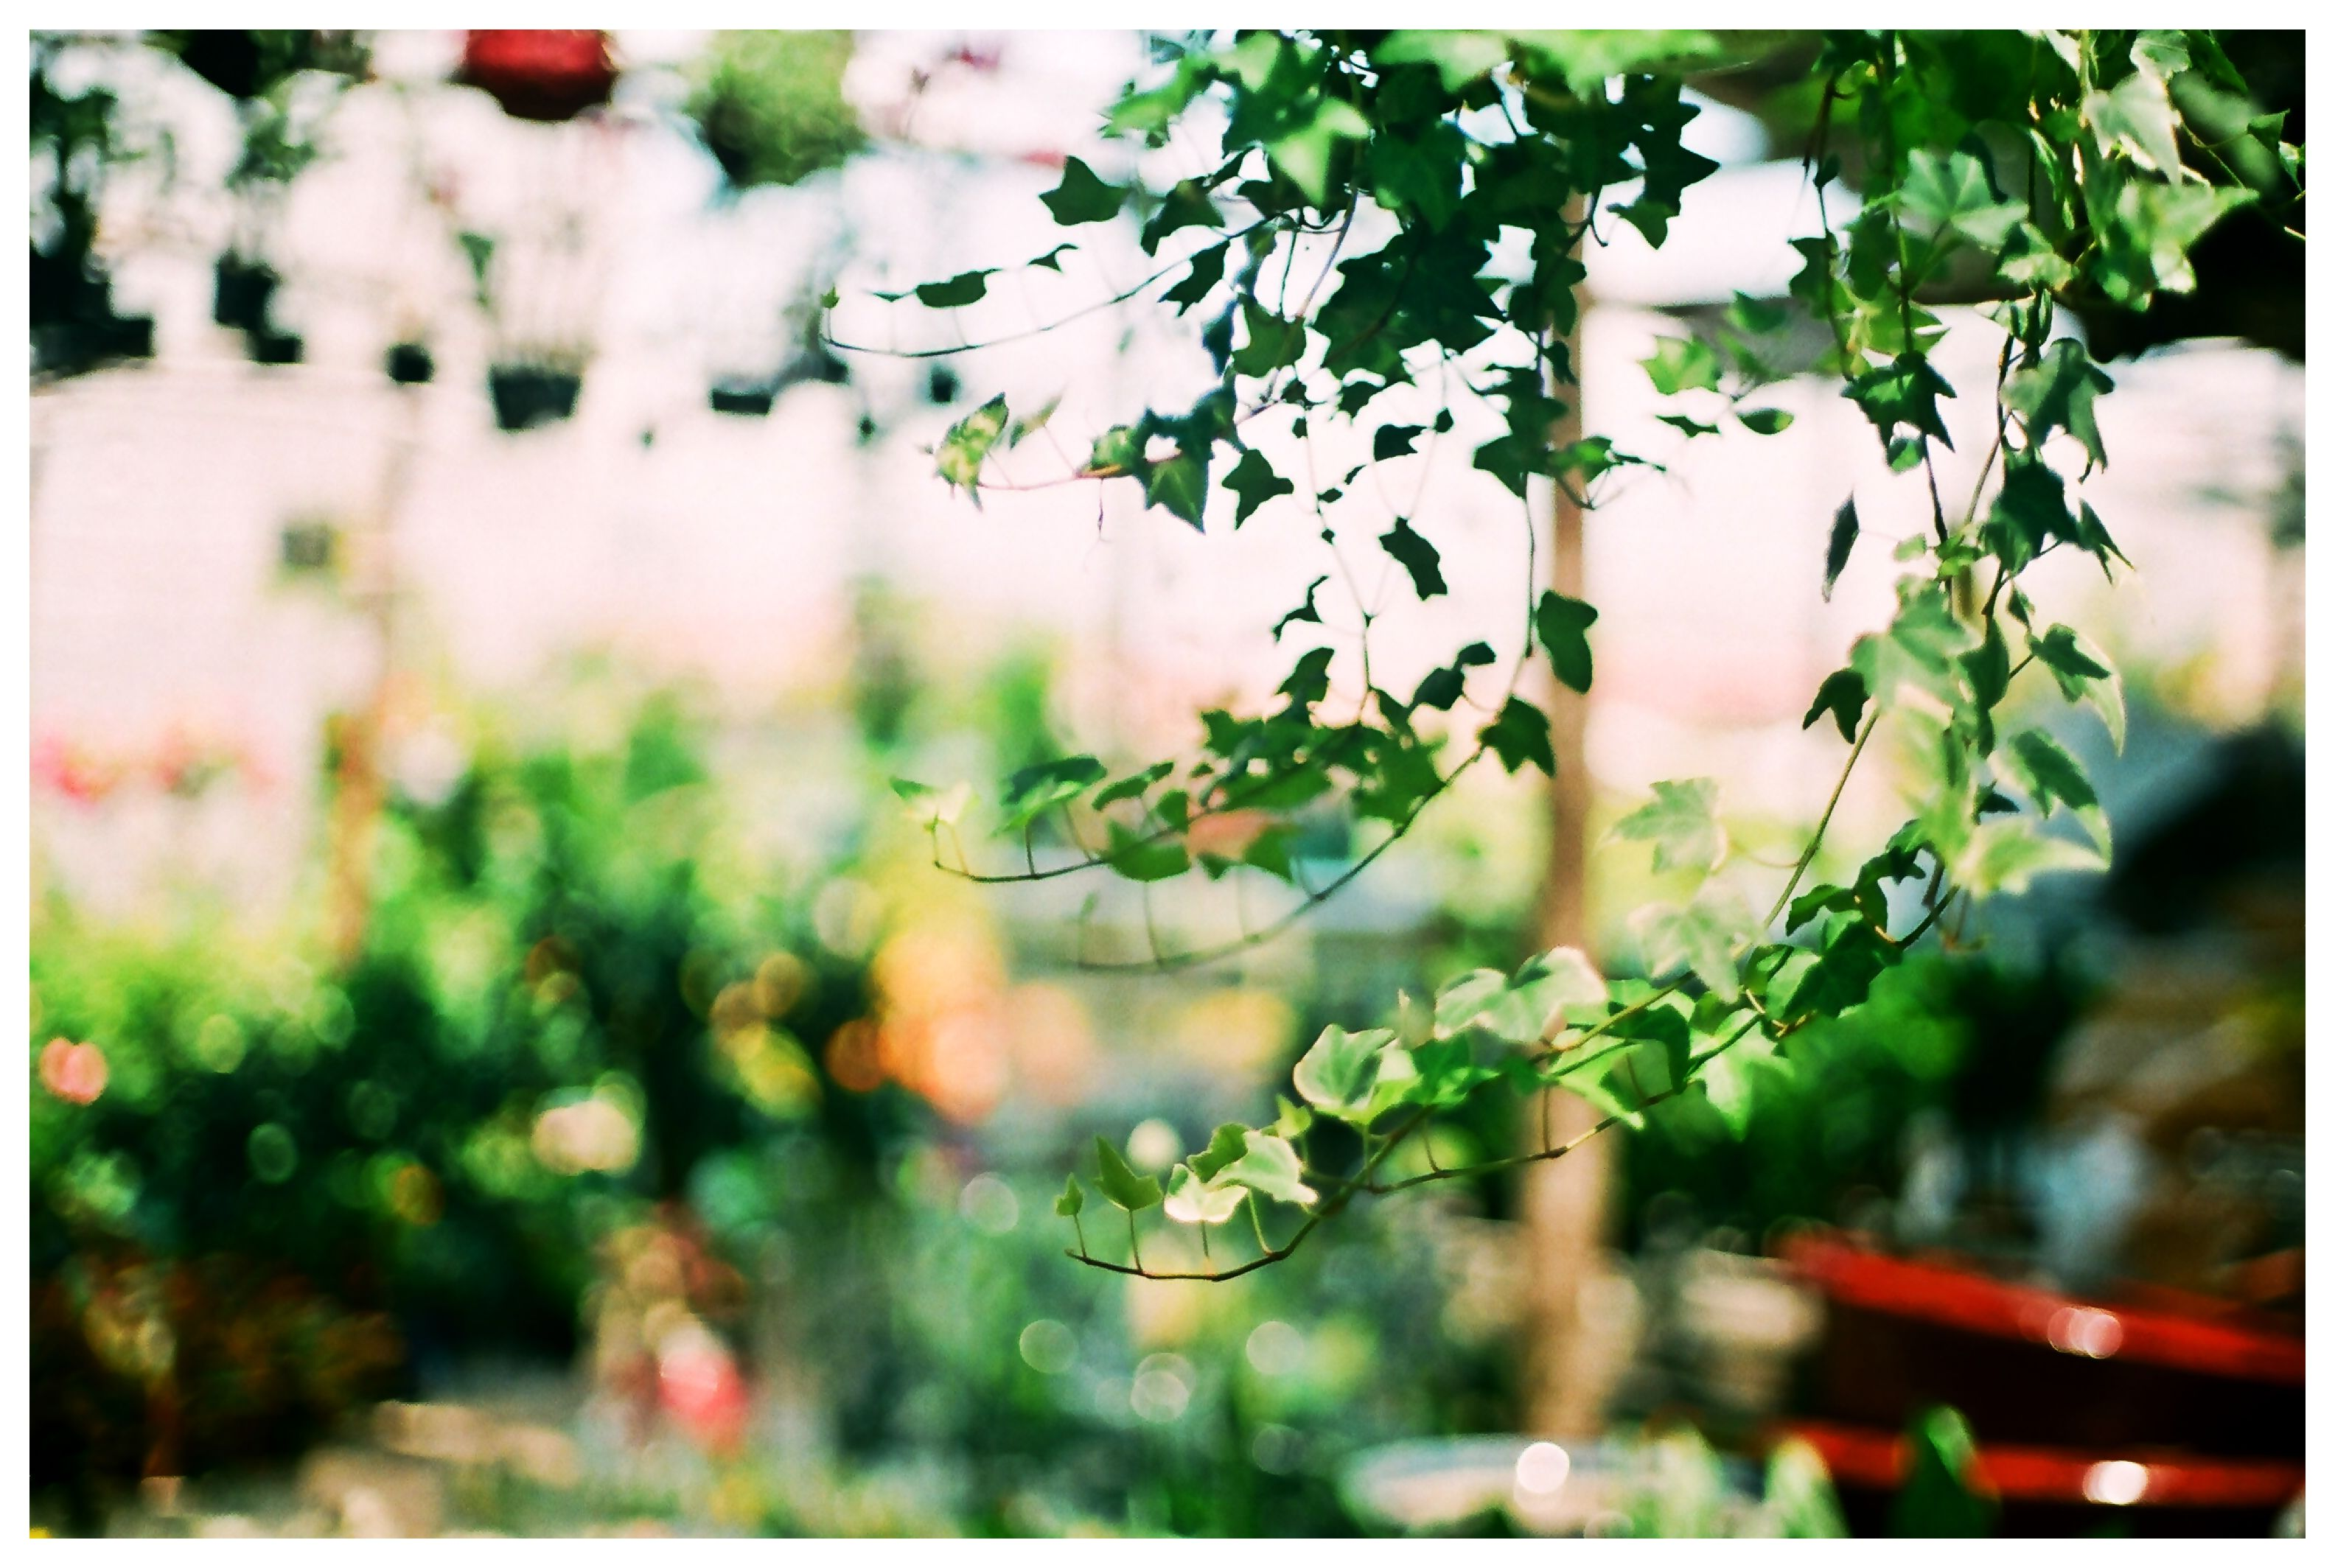 Creeper in nearby garden. Canon T80, Paragon 200, Fujifilm ProPlus 200. #flower #filmphoto